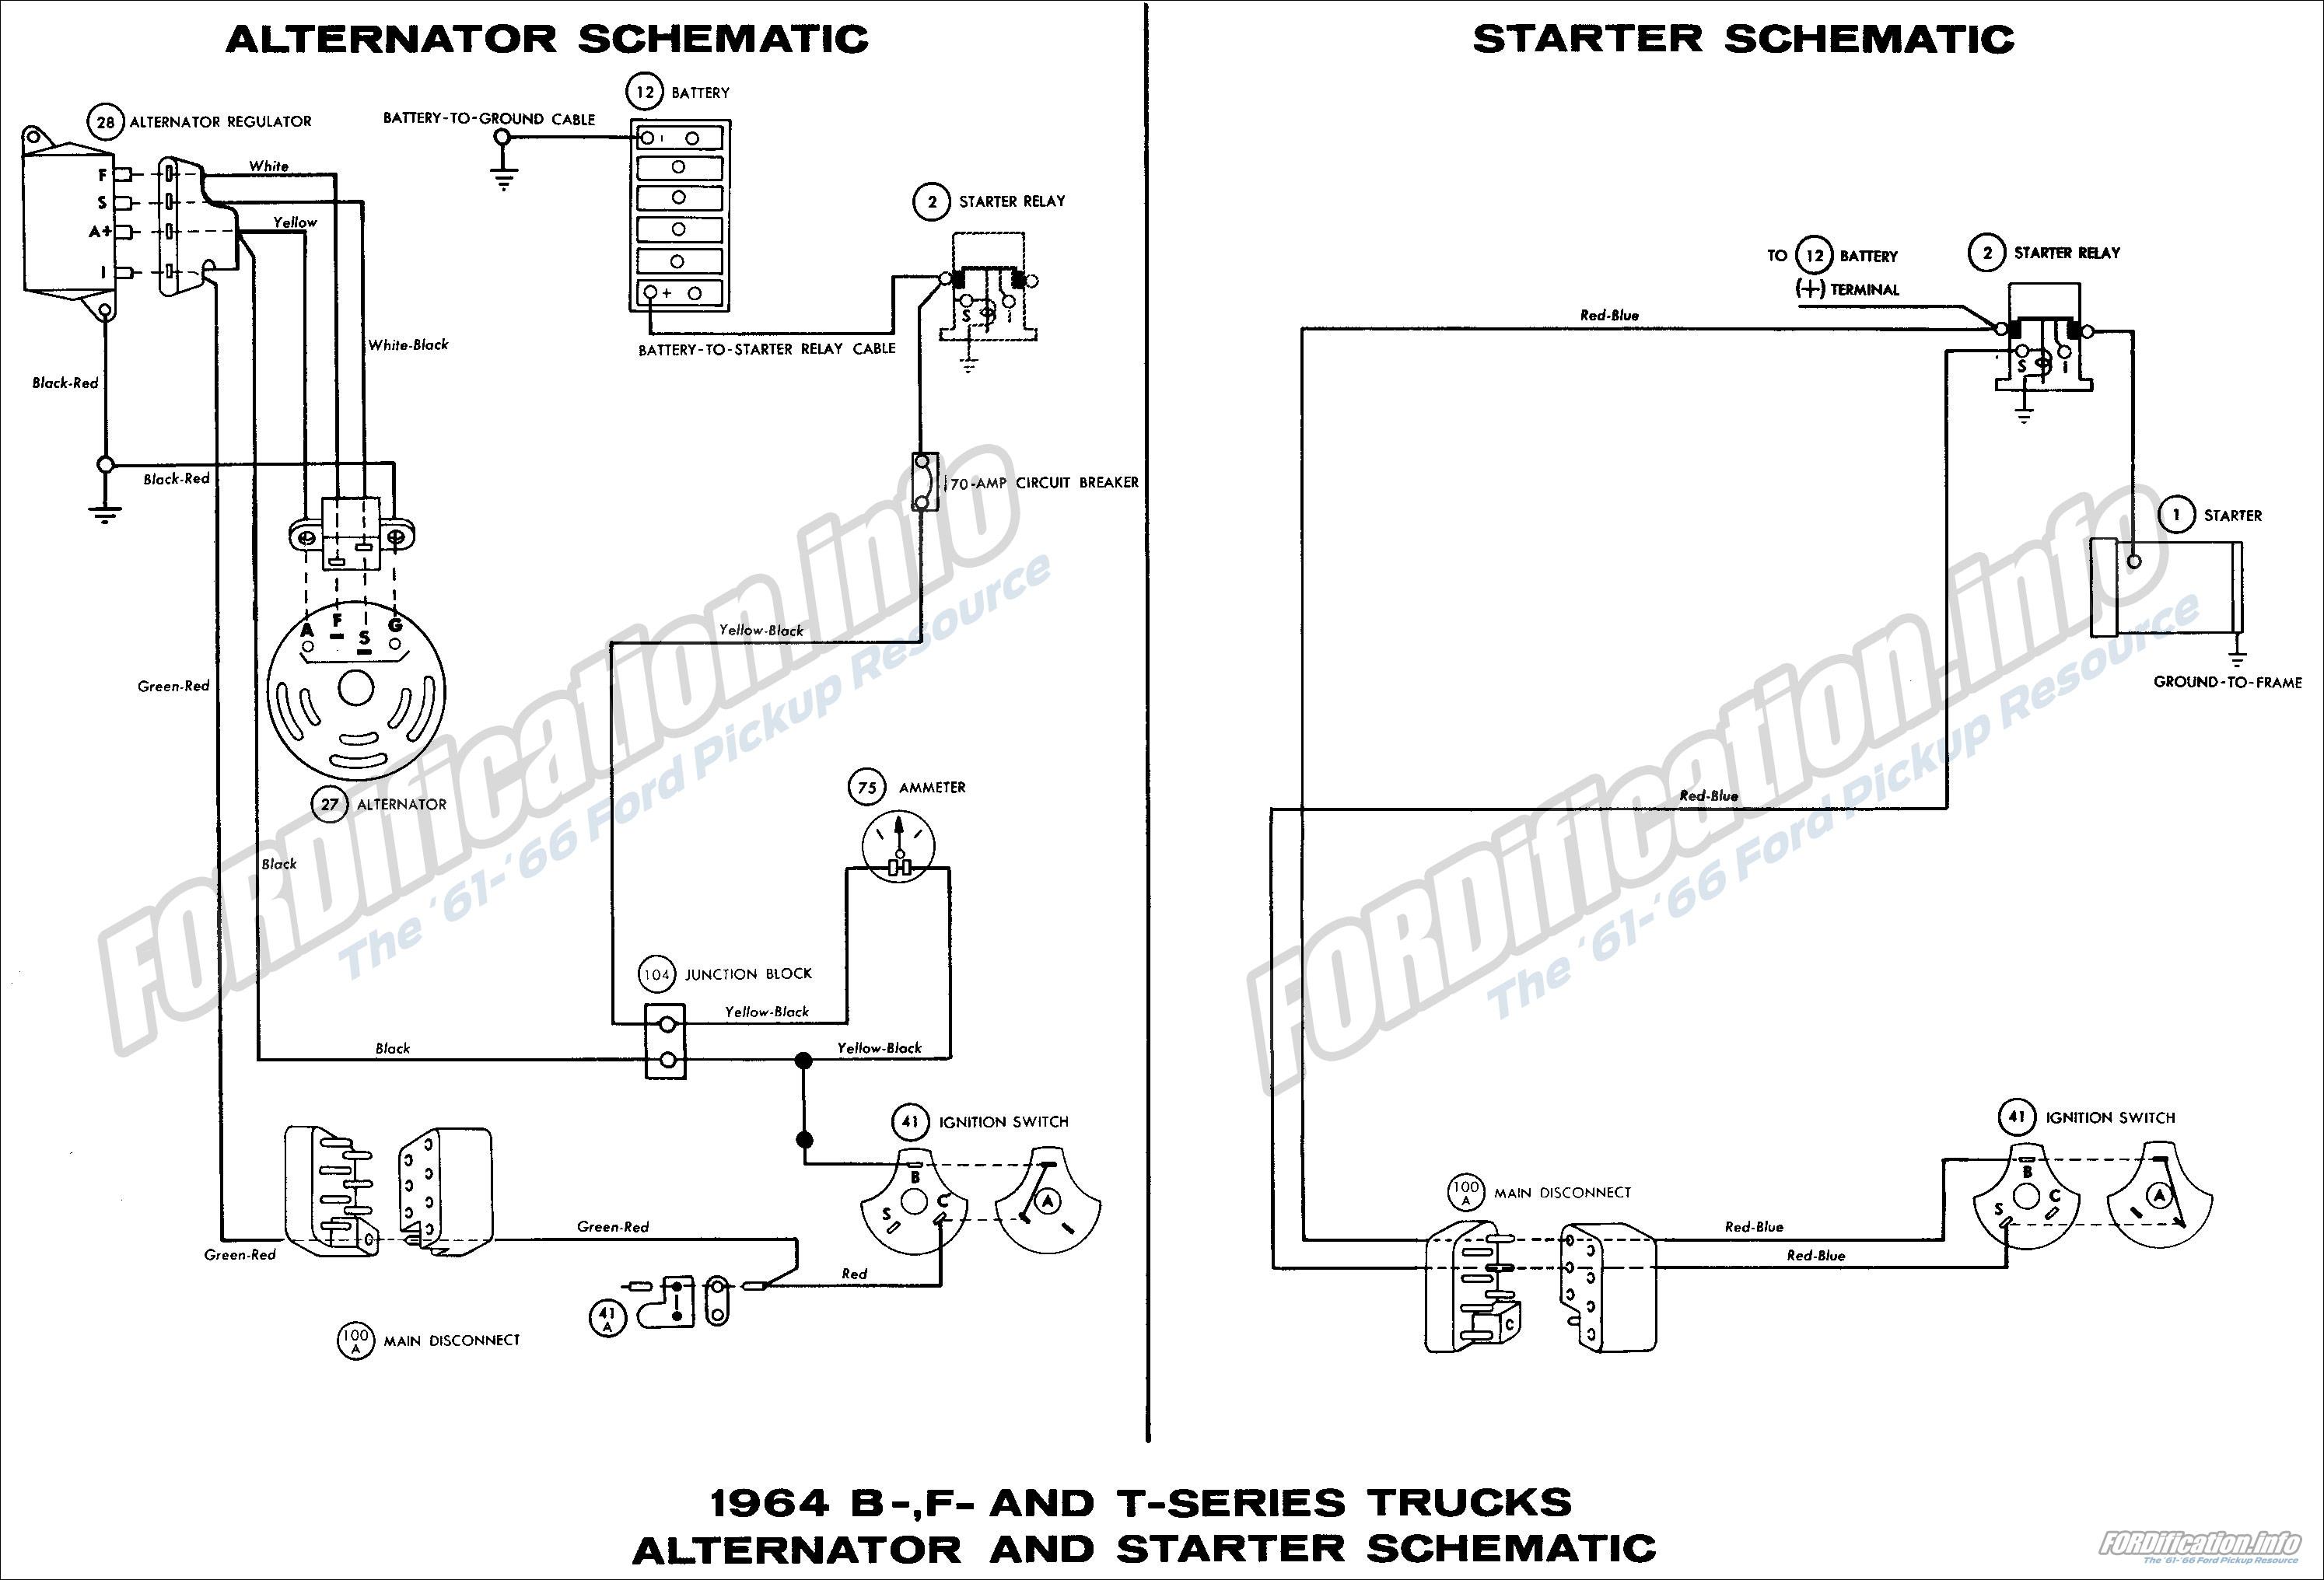 1964 Vw Alternator Wiring Best Secret Diagram Ford Truck Auto Hook Up